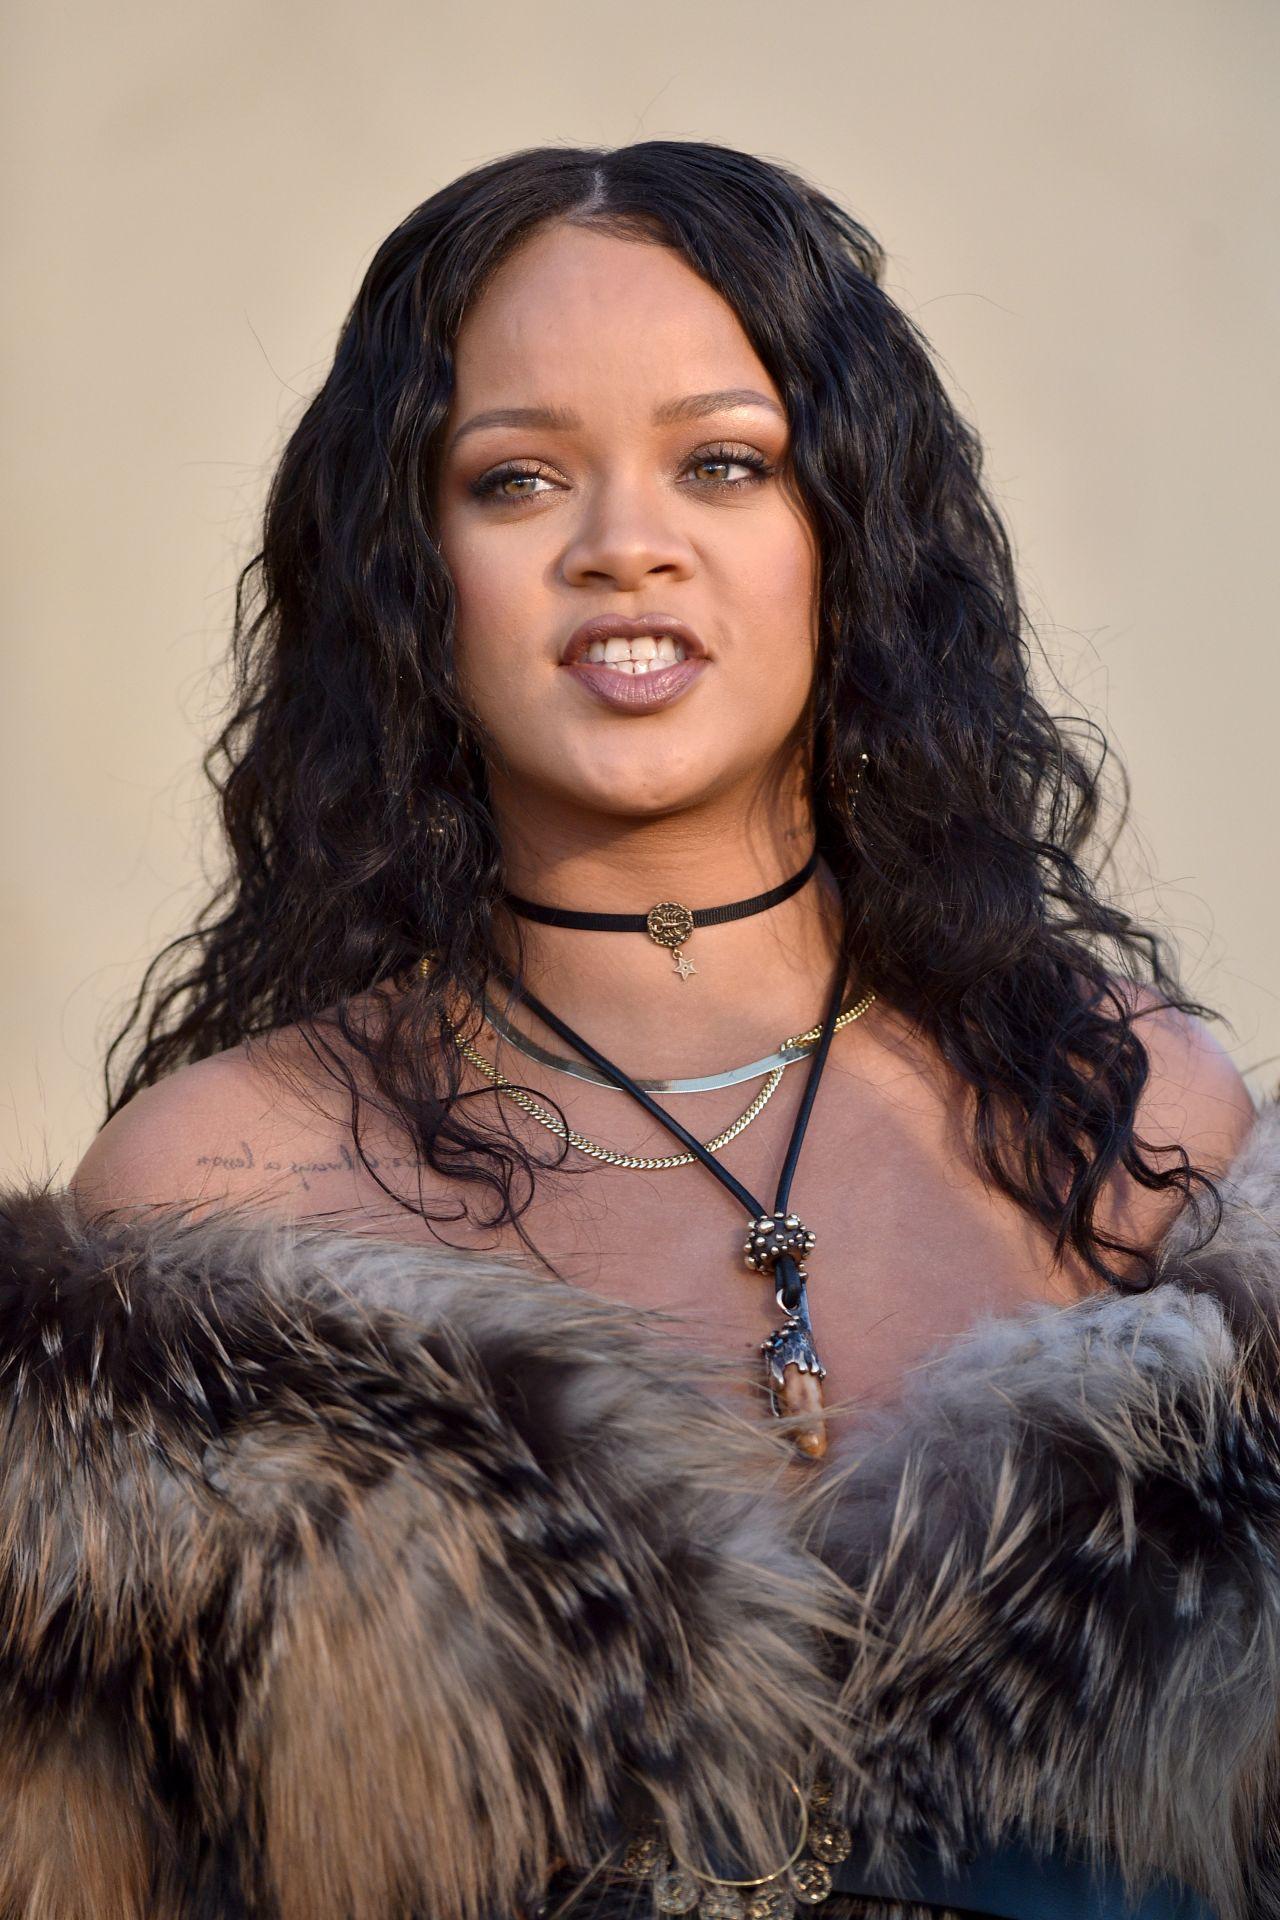 Rihanna Christian Dior Cruise 2018 In La 05 11 2017